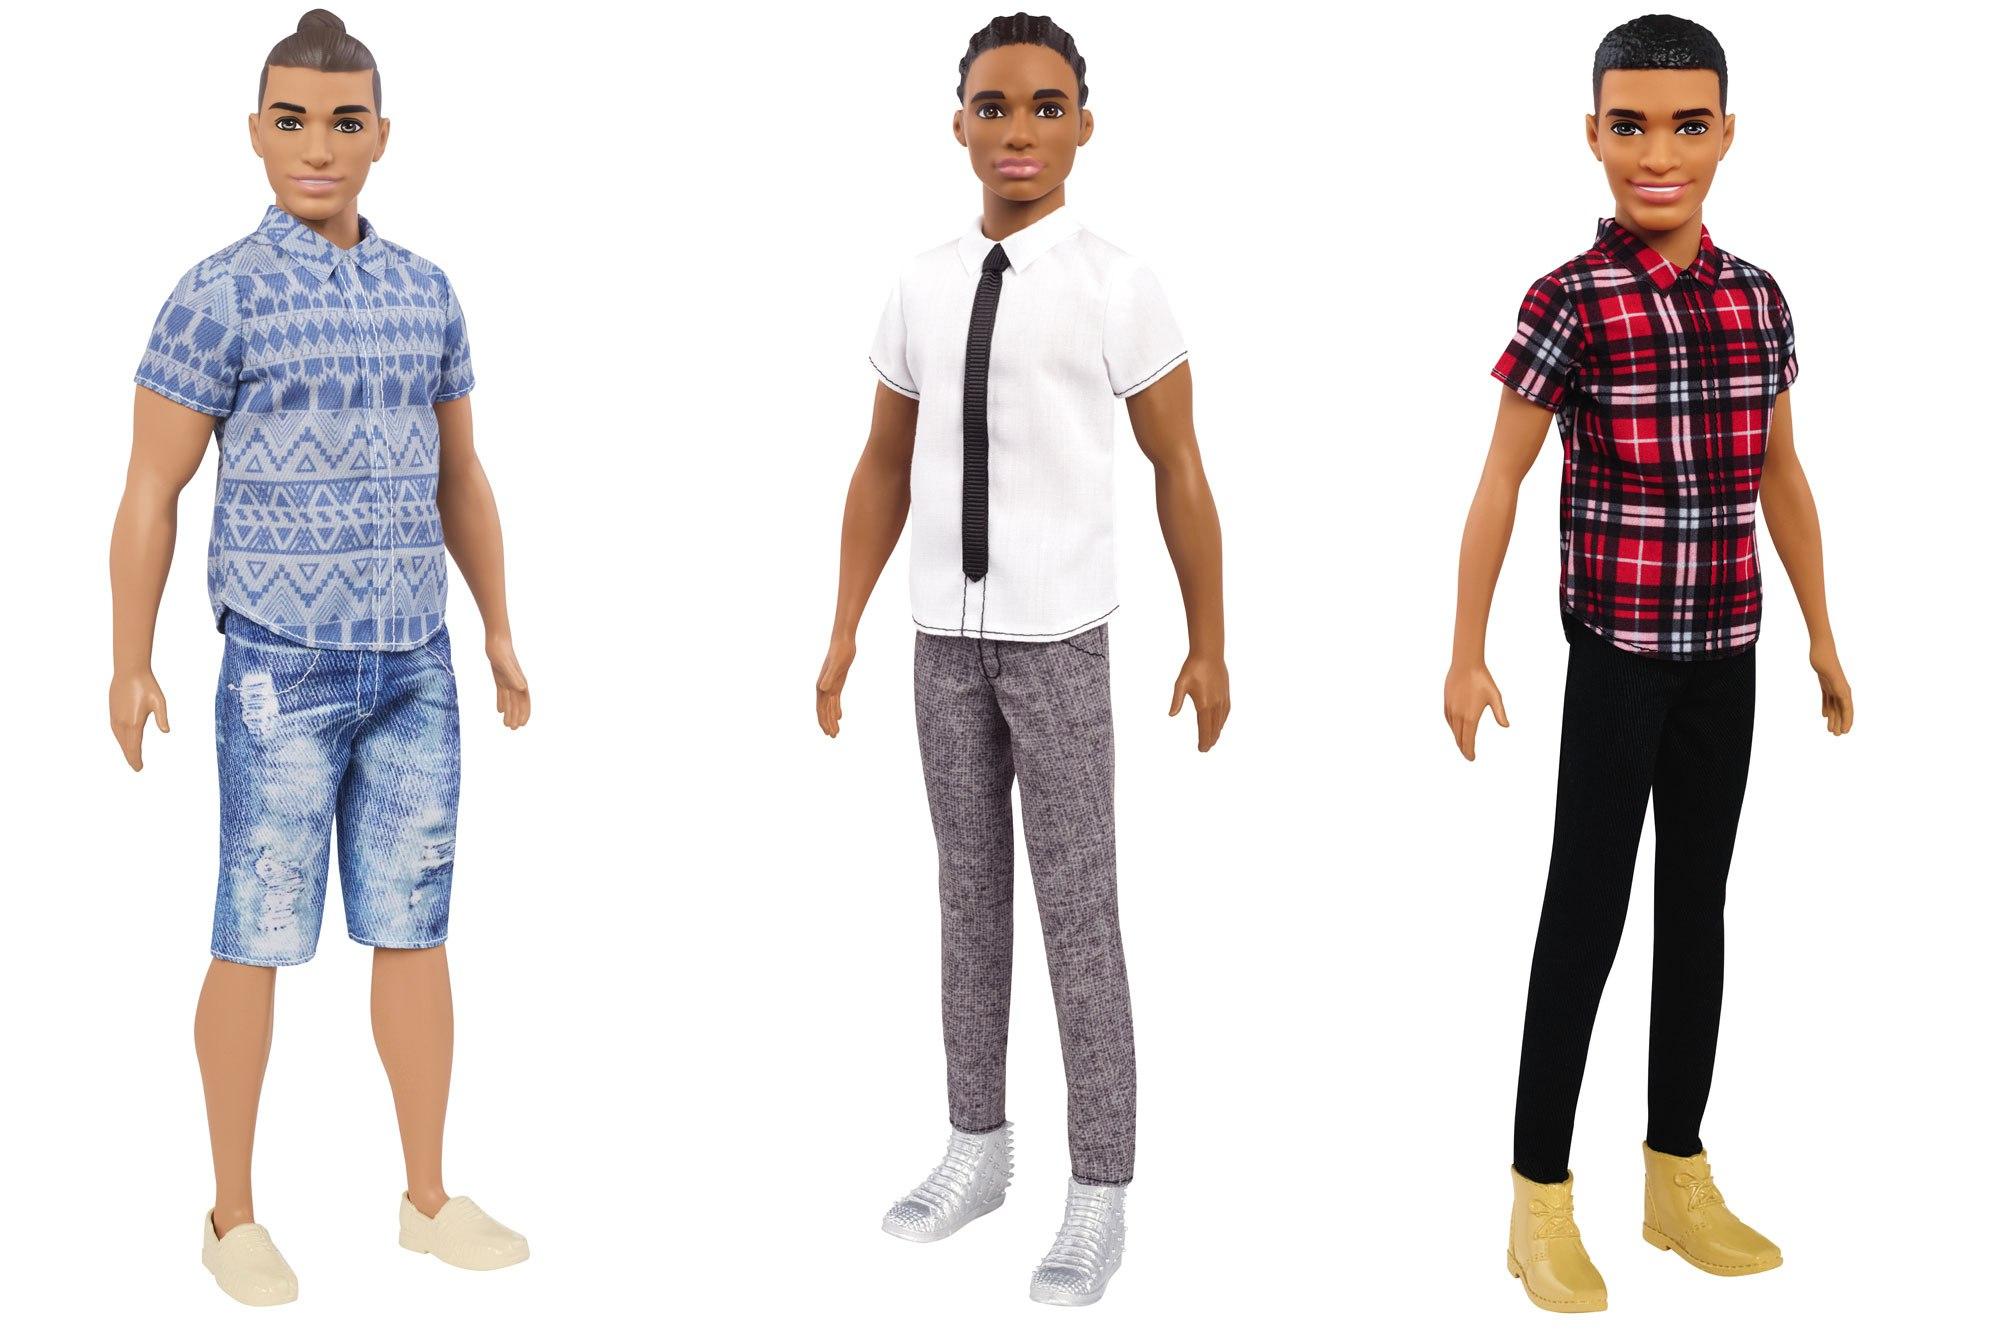 ken-dolls.jpg